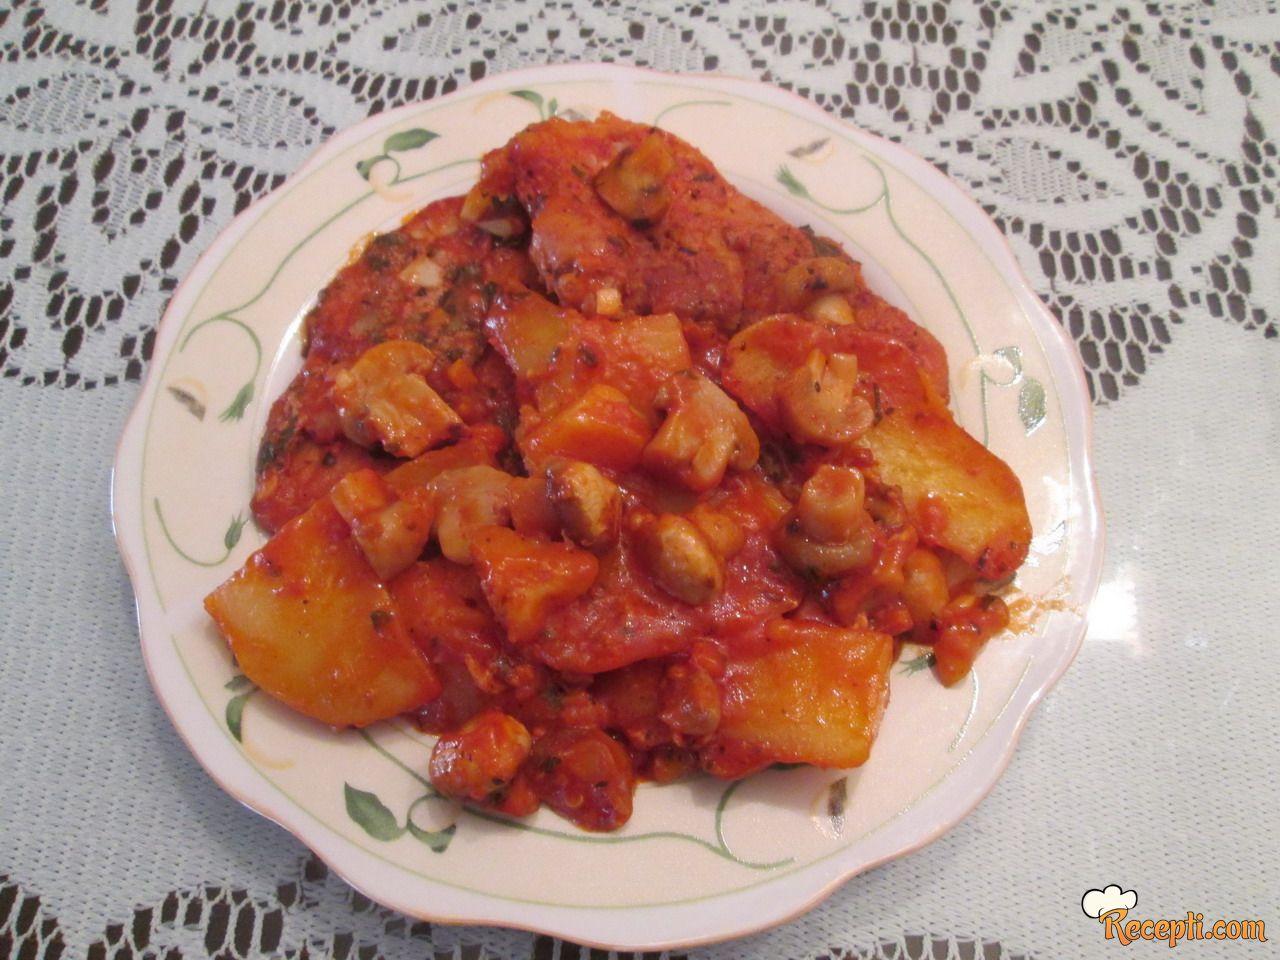 Svinjske šnicle u paradajz sosu